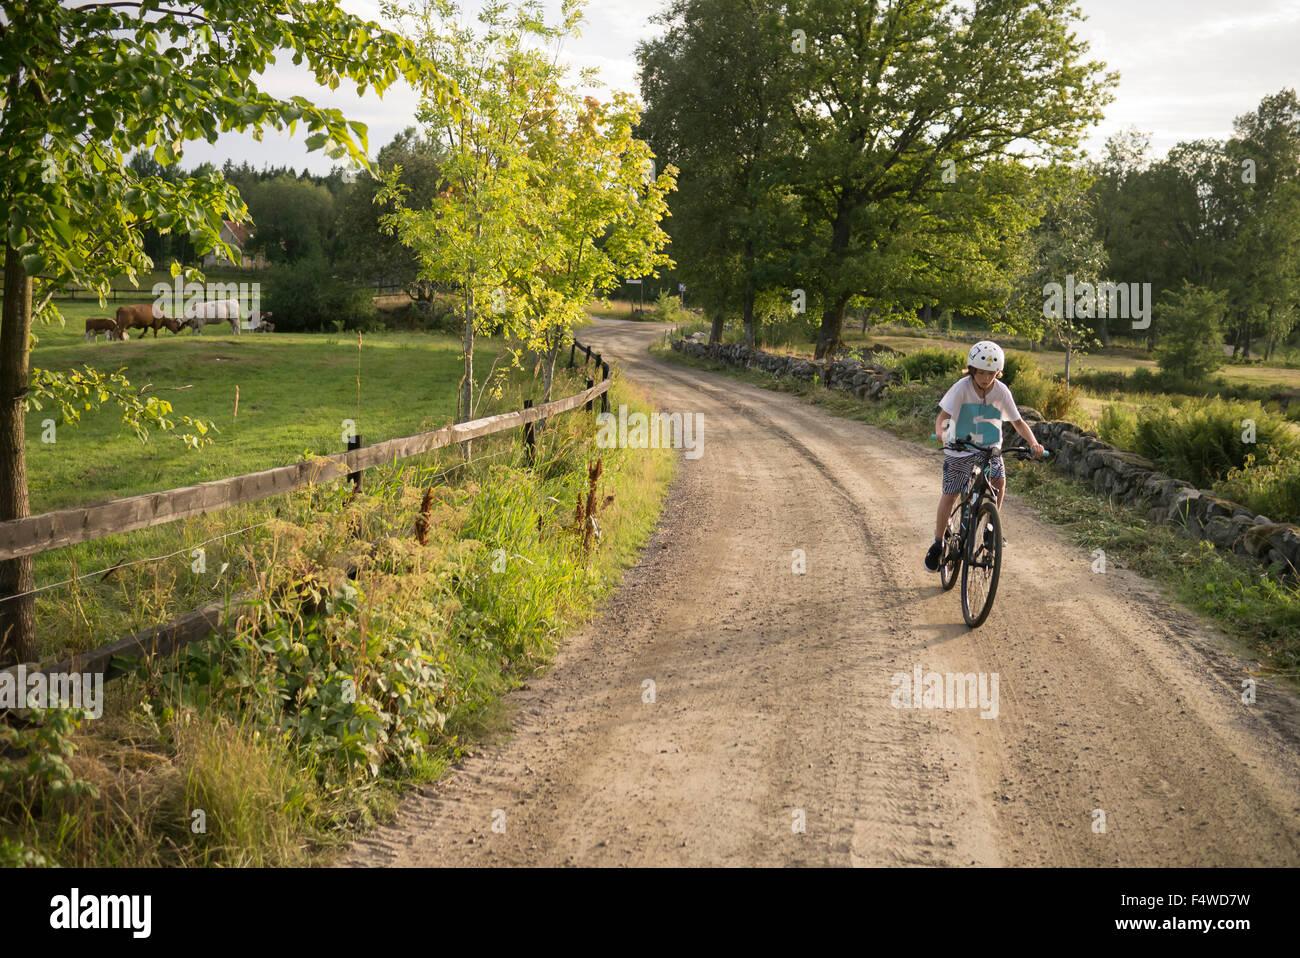 Sweden, Vastergotland, Lerum, Slatthult, Boy (10-11) on bicycle outdoors Stock Photo